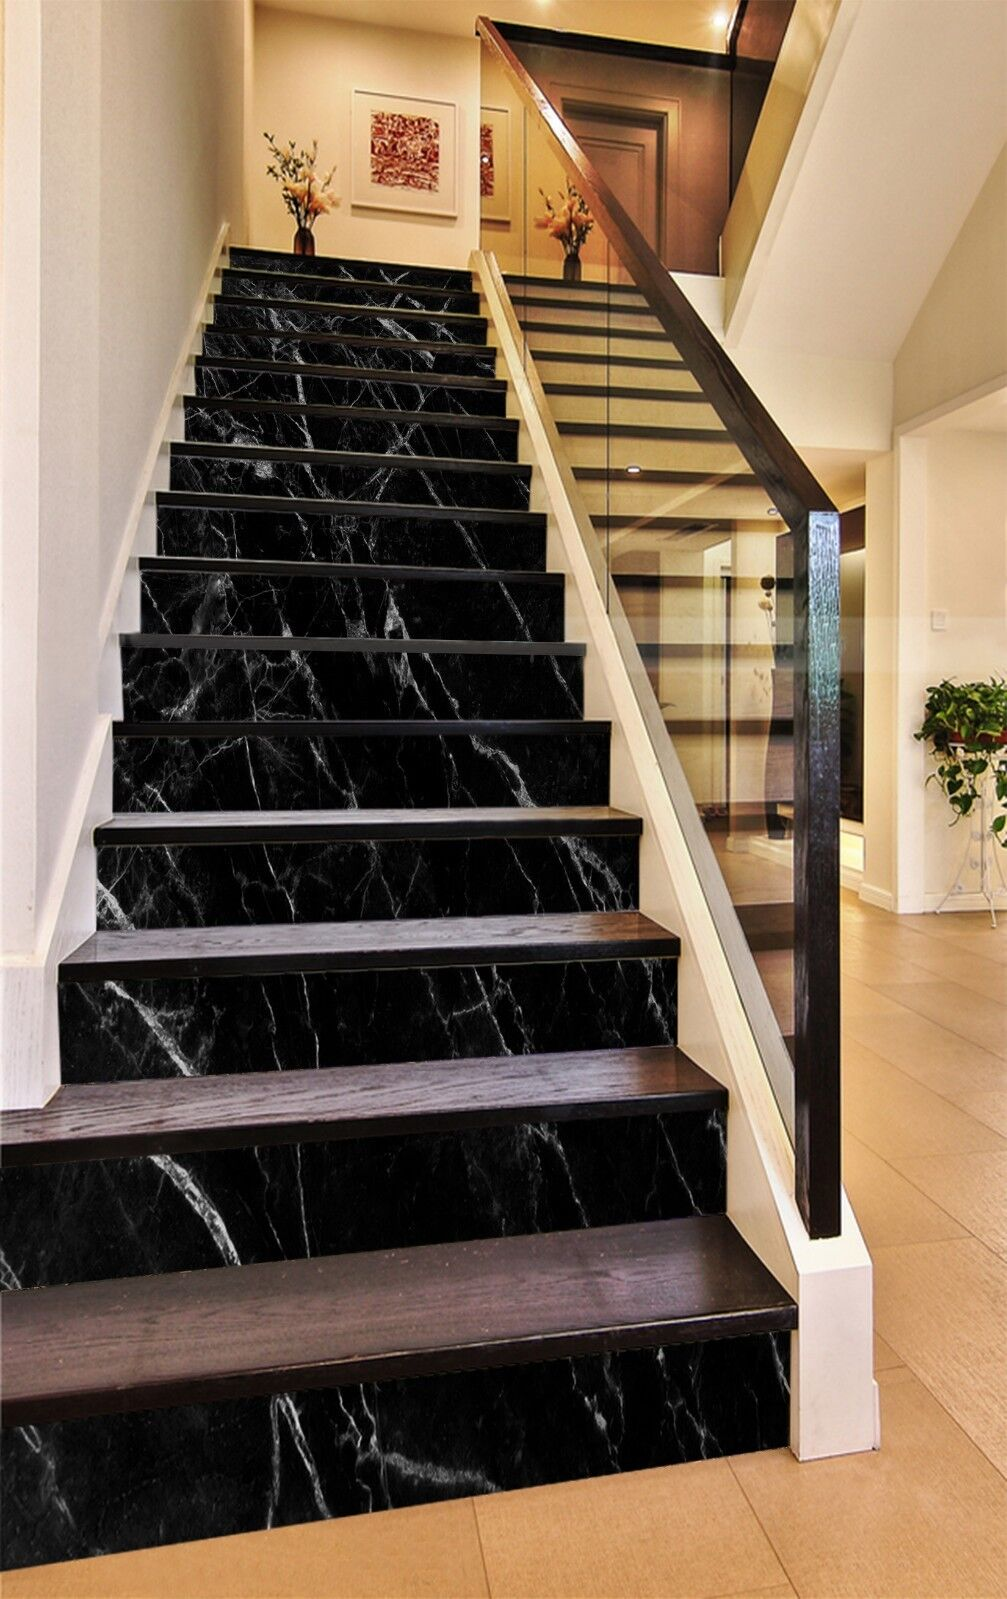 3D Rein Schwarz 89 Fliese Marmor Stair Risers Fototapete Vinyl Aufkleber Tapete